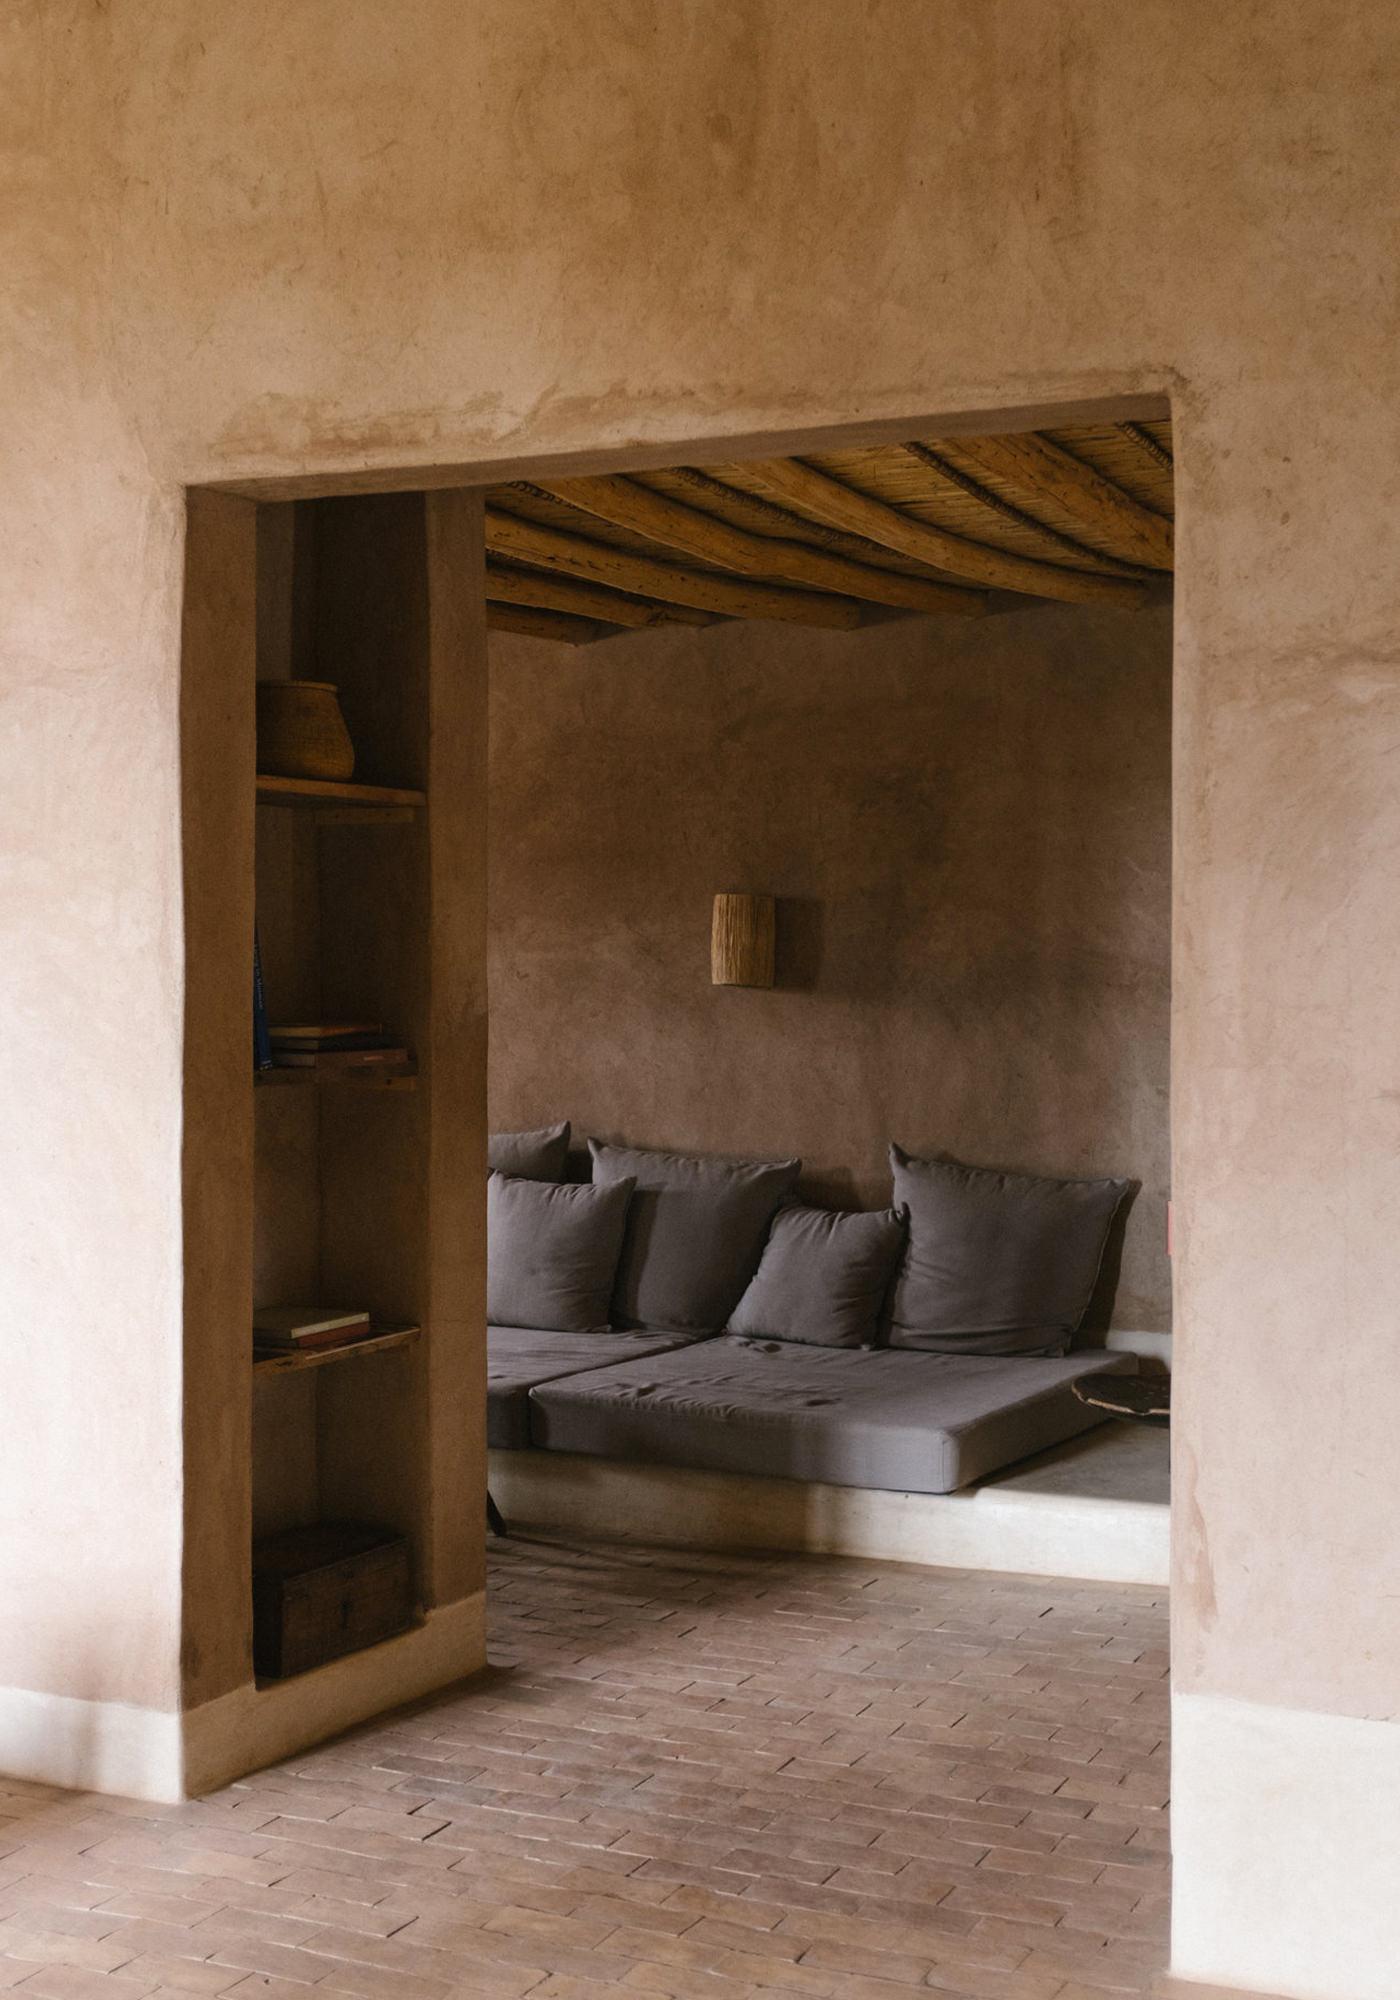 Berber Lodge Hotel Maison Oumnas Maroc Salon